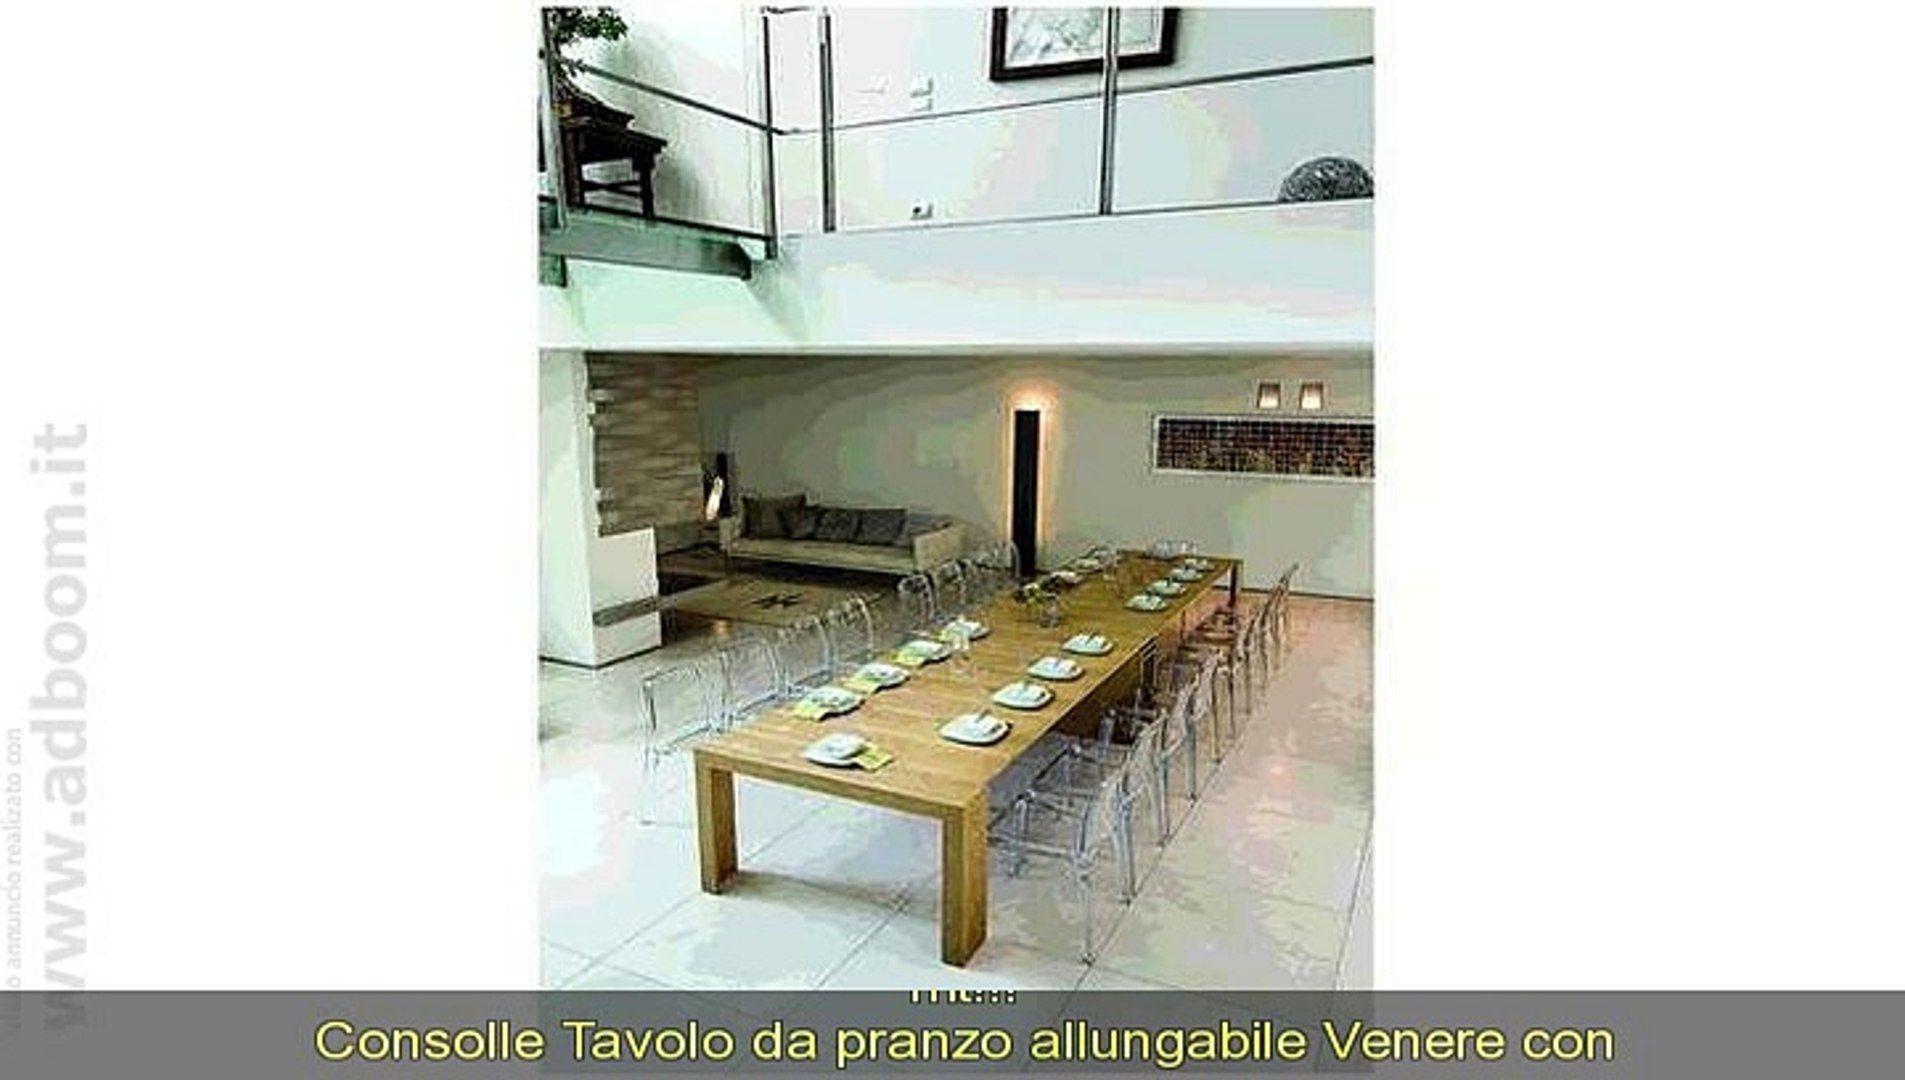 Pesaro E Urbino Fano Consolle Venere Euro 1 047 Video Dailymotion